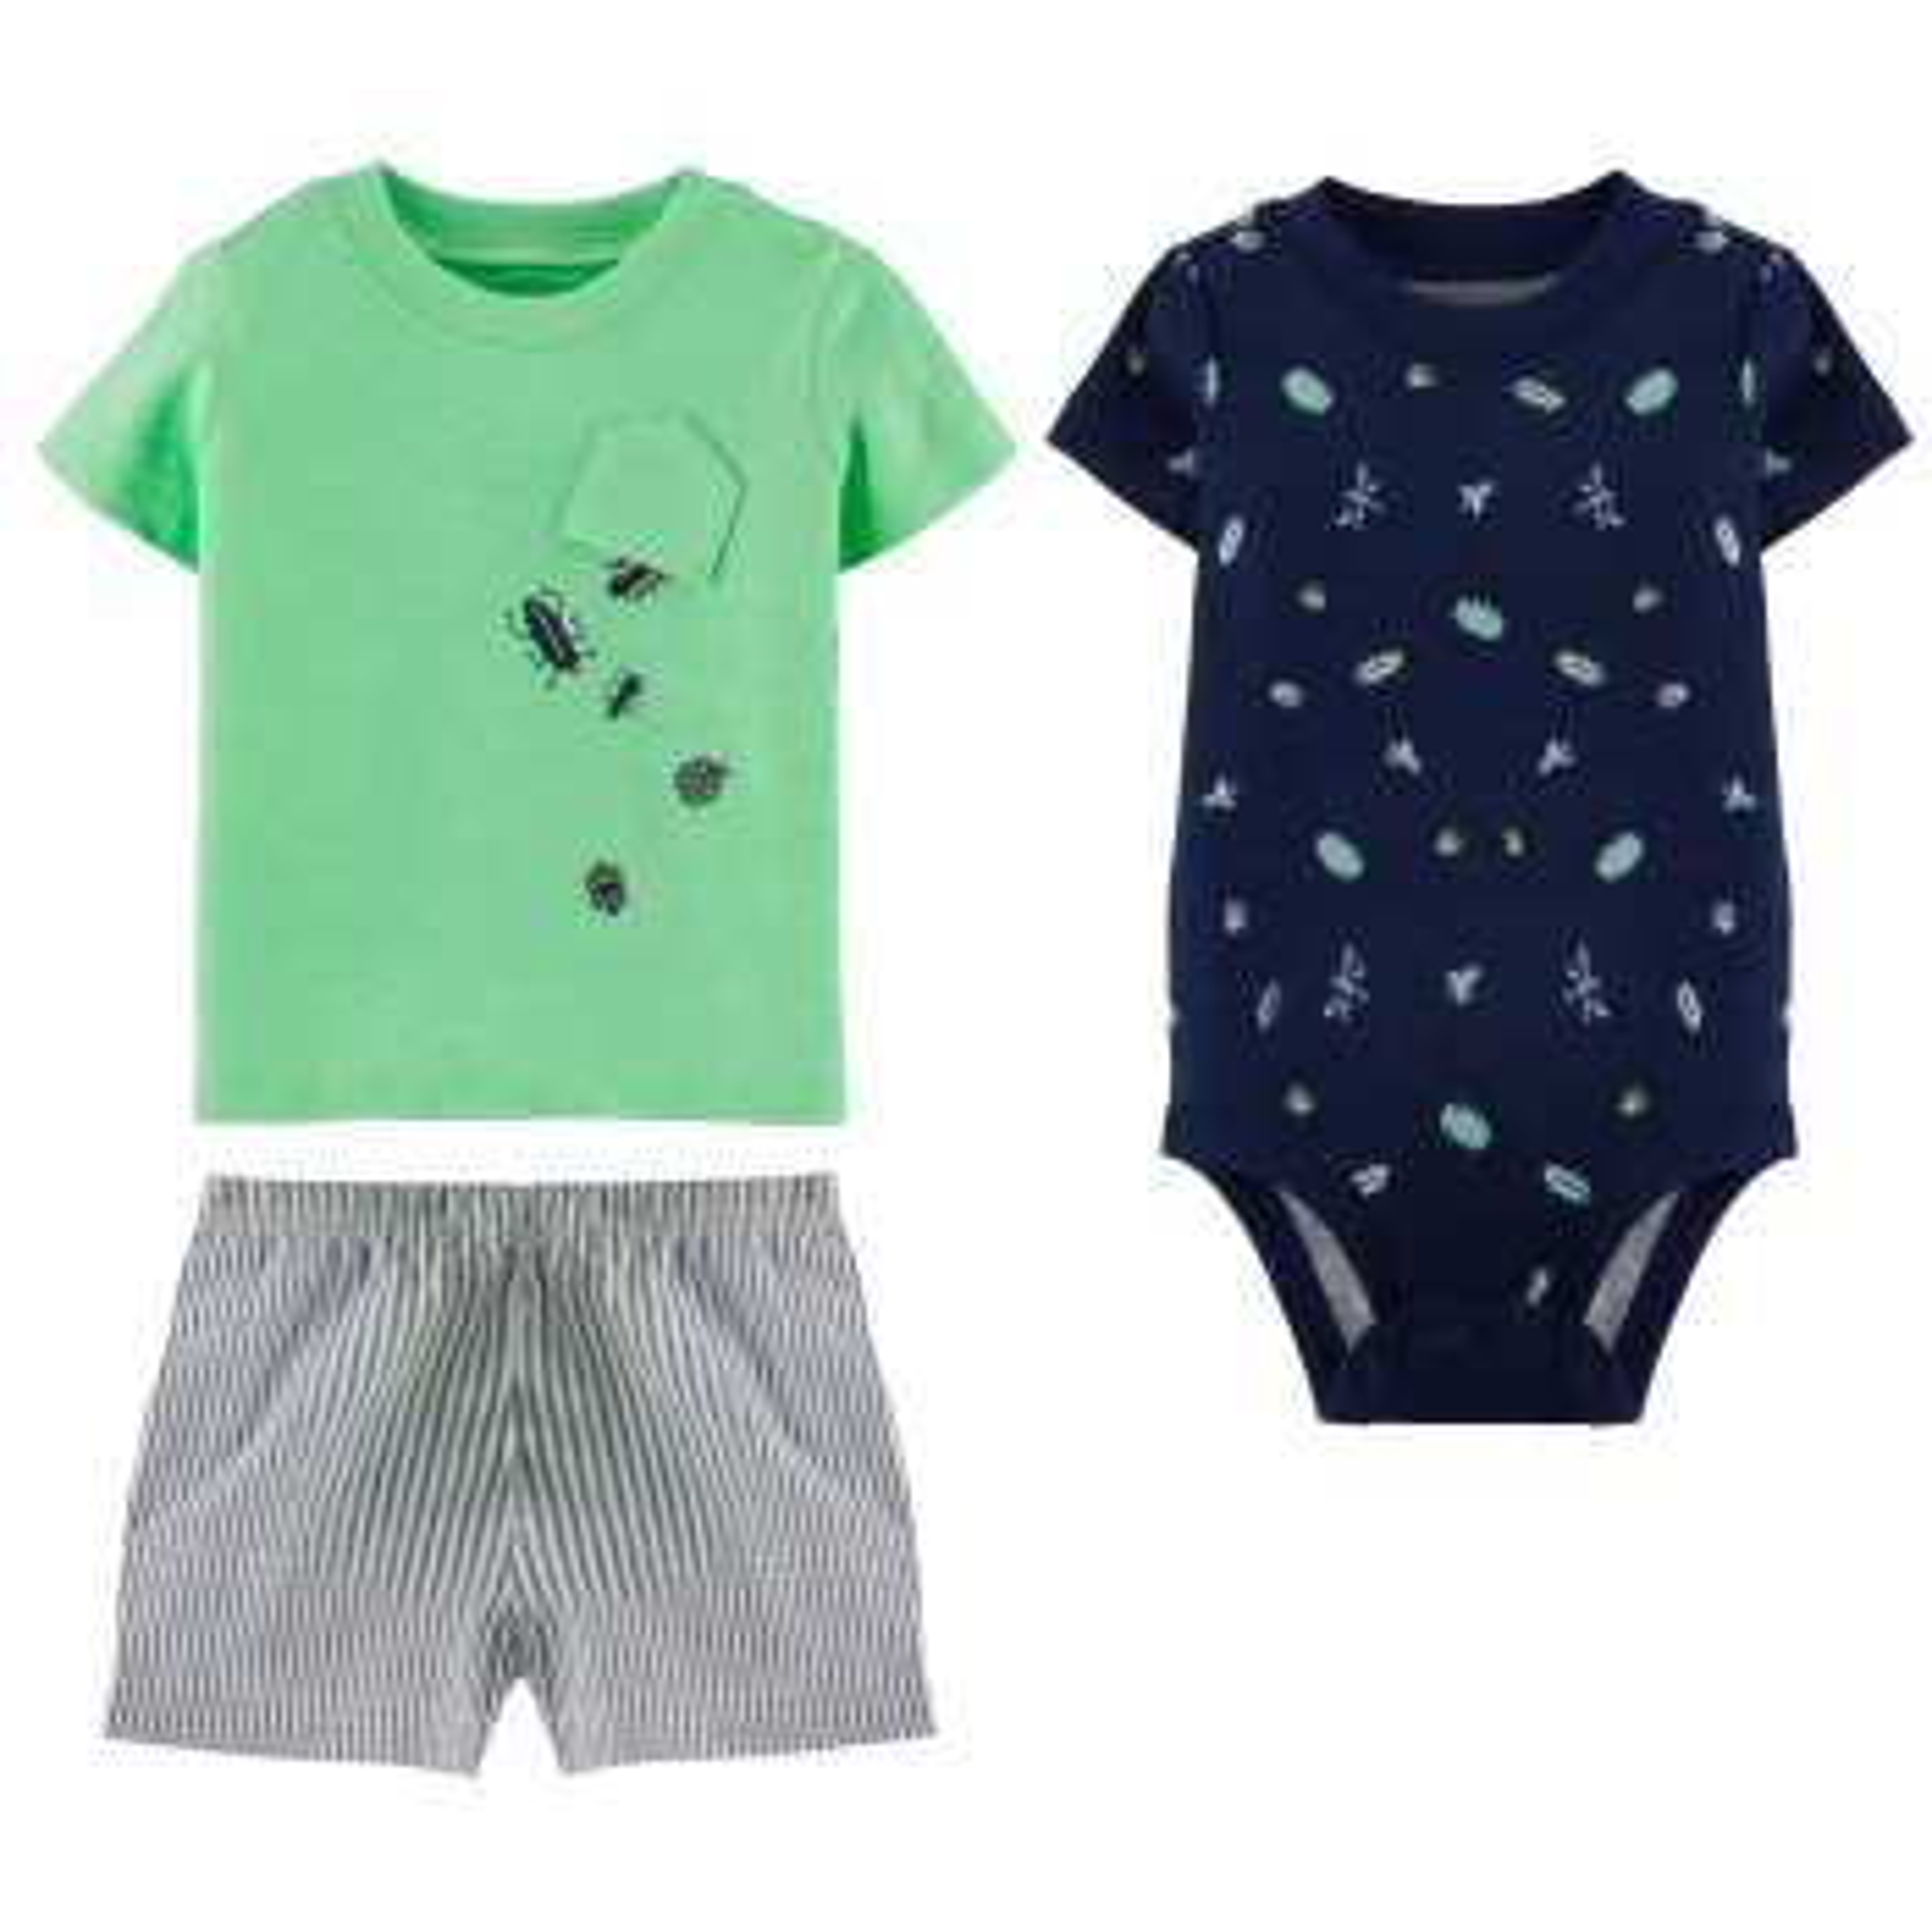 ست 3 تکه لباس نوزادی پسرانه کارترز کد 1182